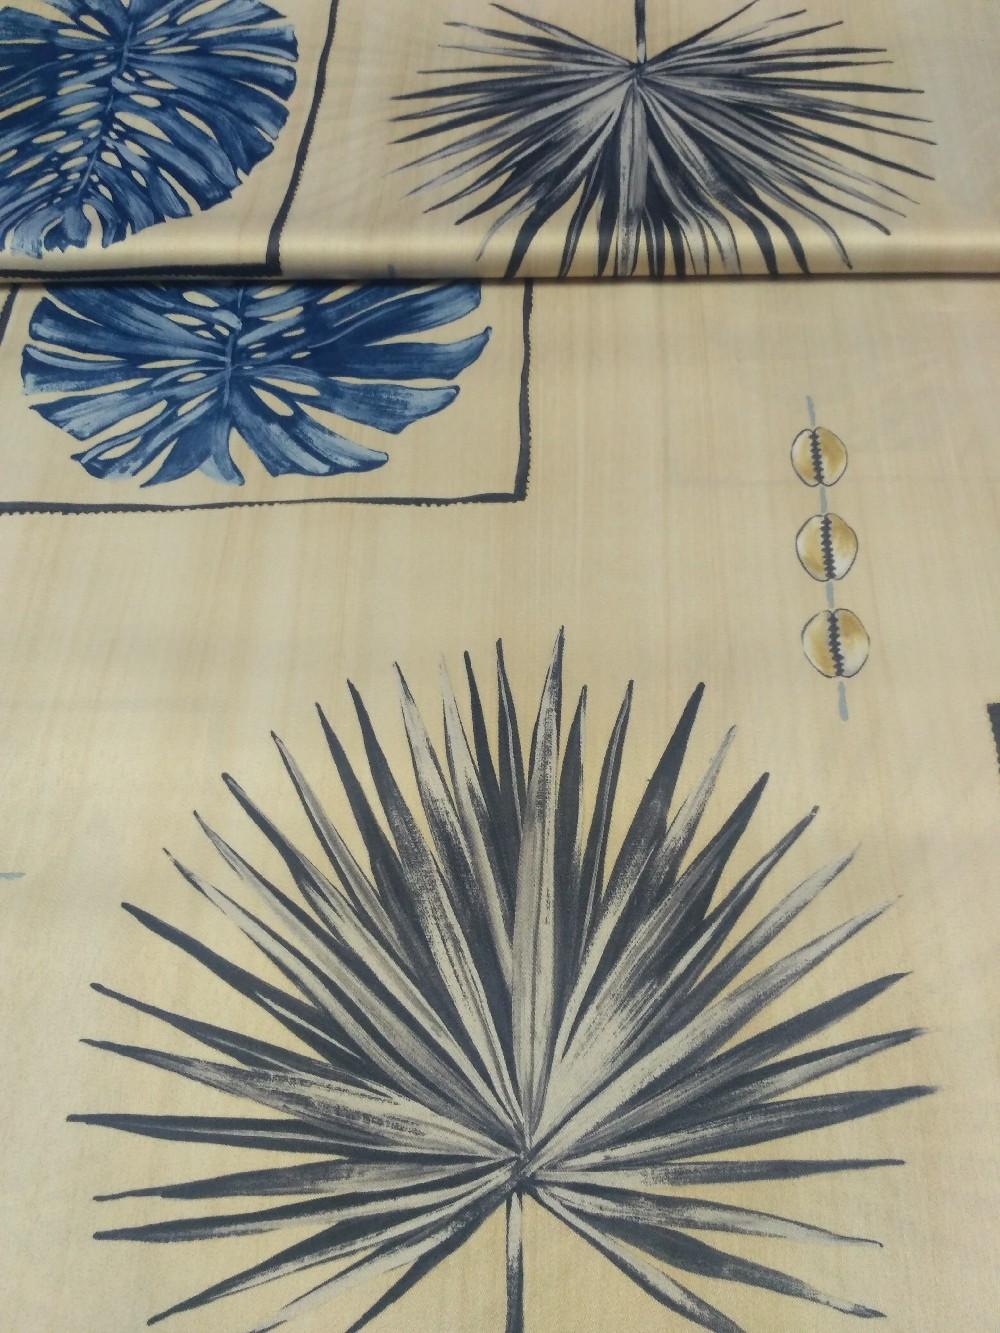 dekoračka béžová šedomodré listy š.150cm